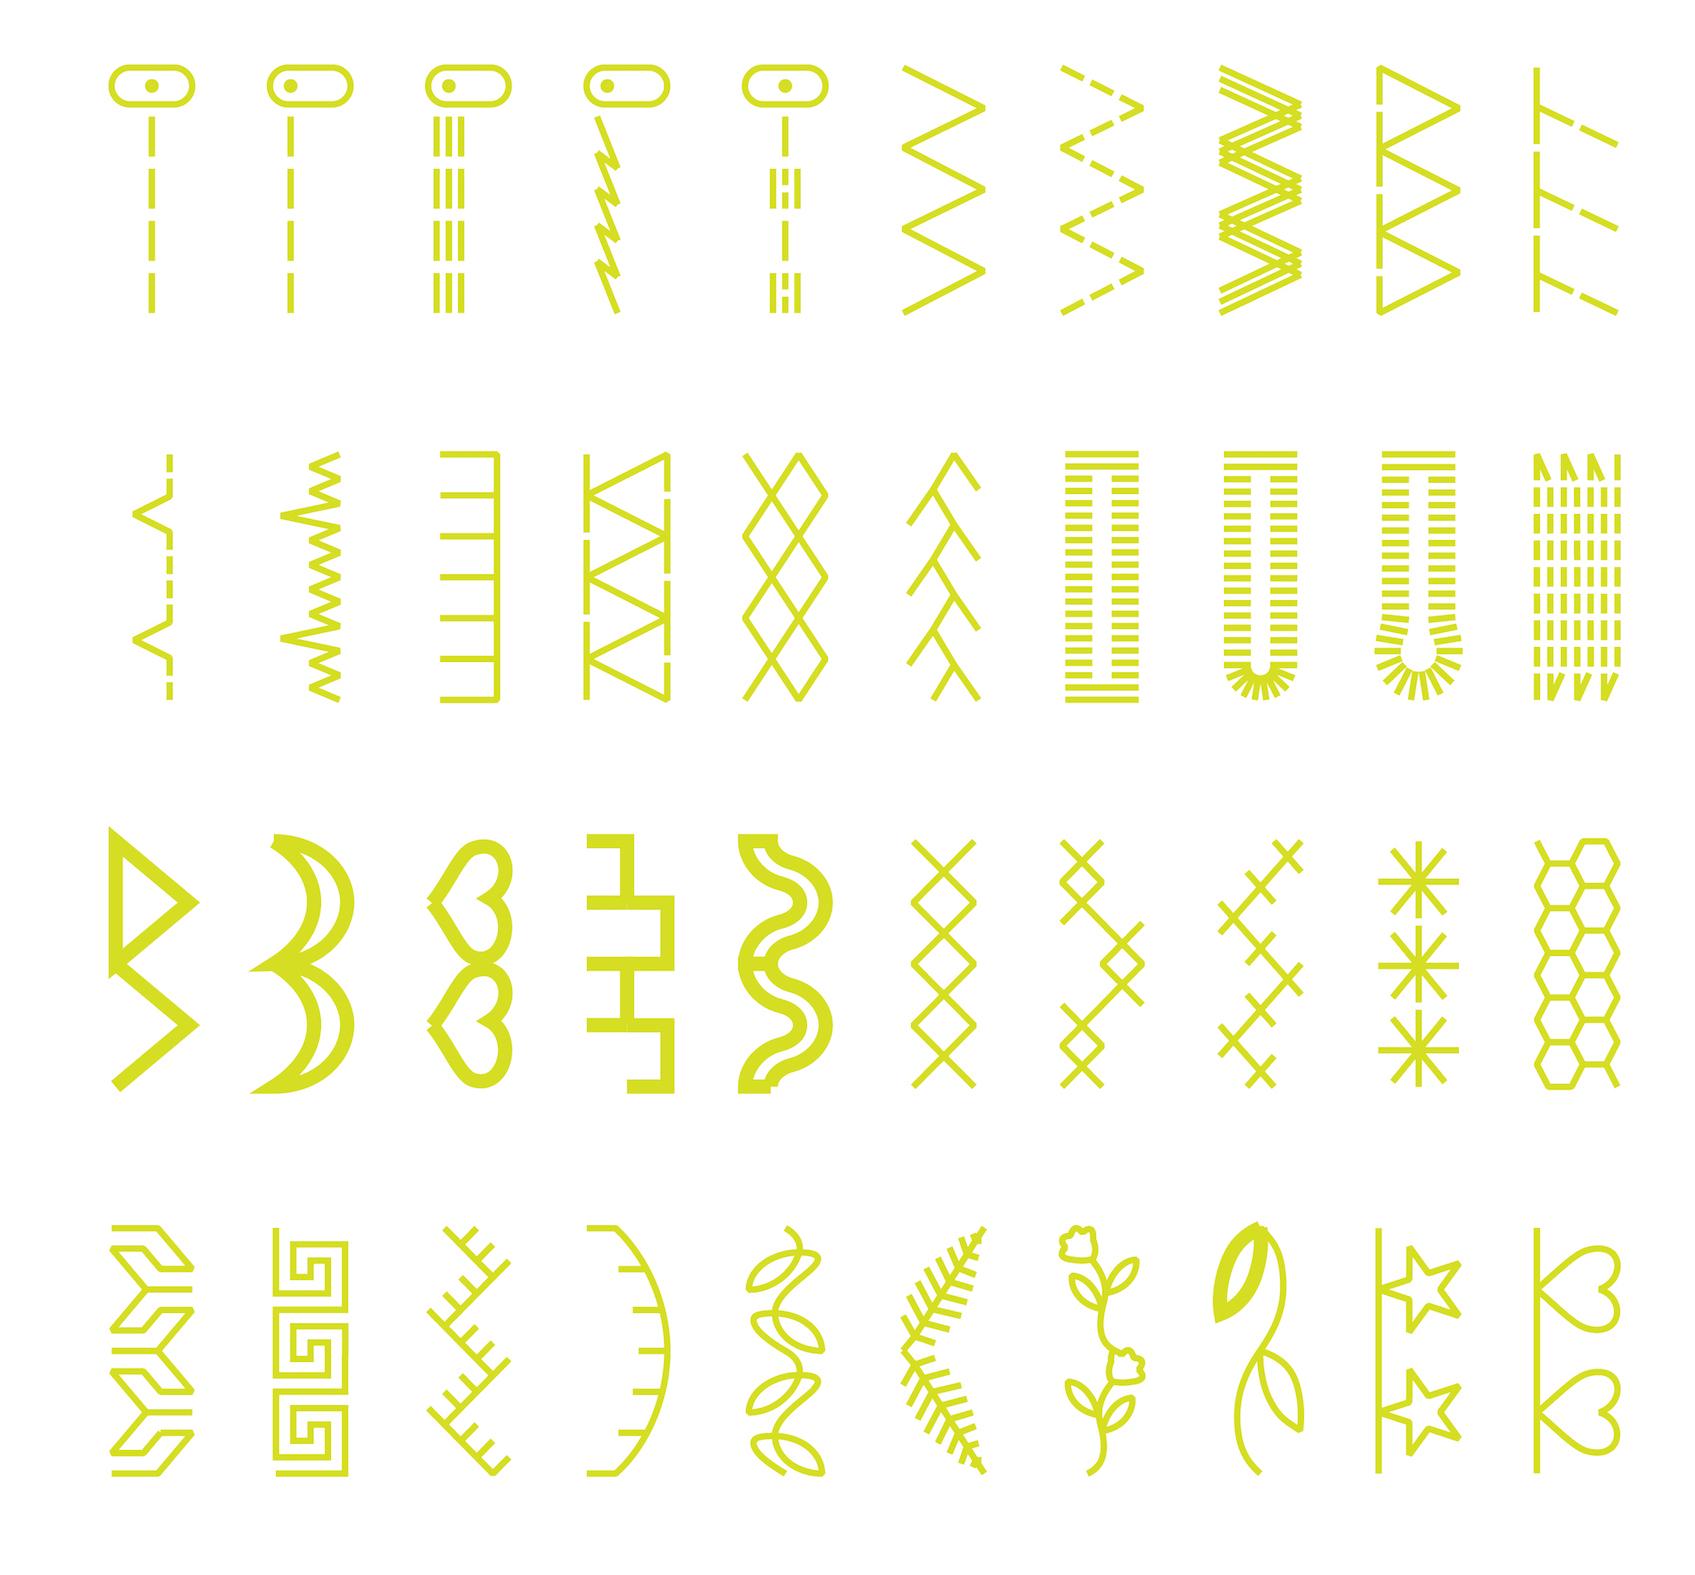 Dorable Stichmuster Nähen Images - Decke Stricken Muster ...